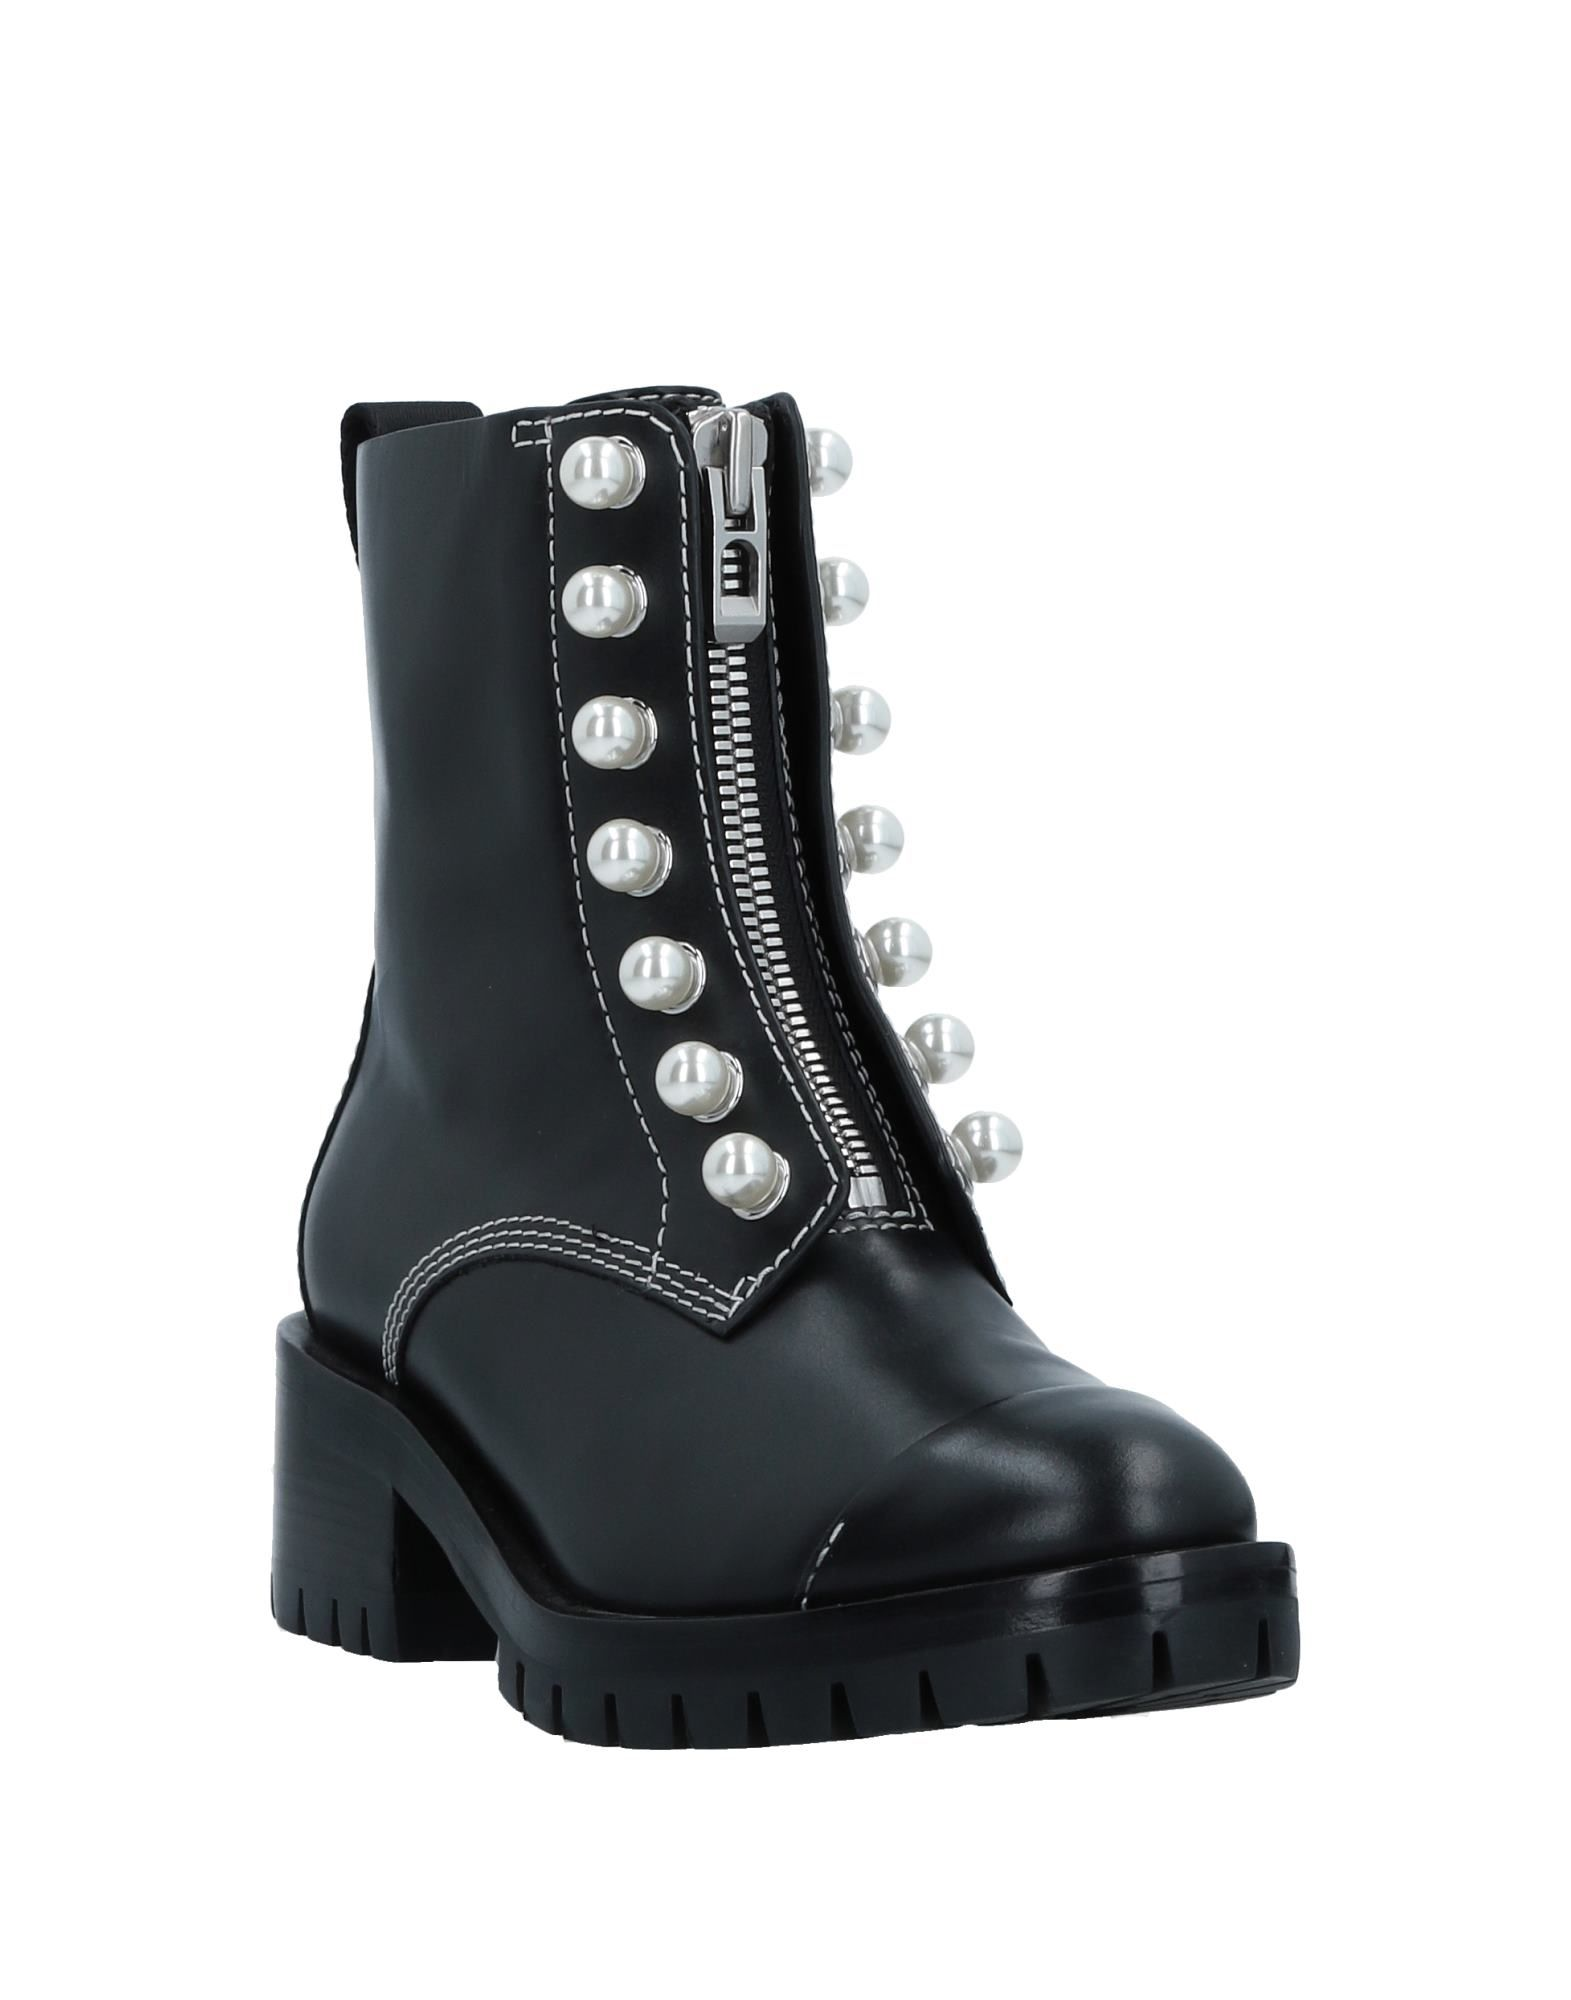 Rabatt Stiefelette Schuhe 3.1 Phillip Lim Stiefelette Rabatt Damen  11515335CJ 167efb